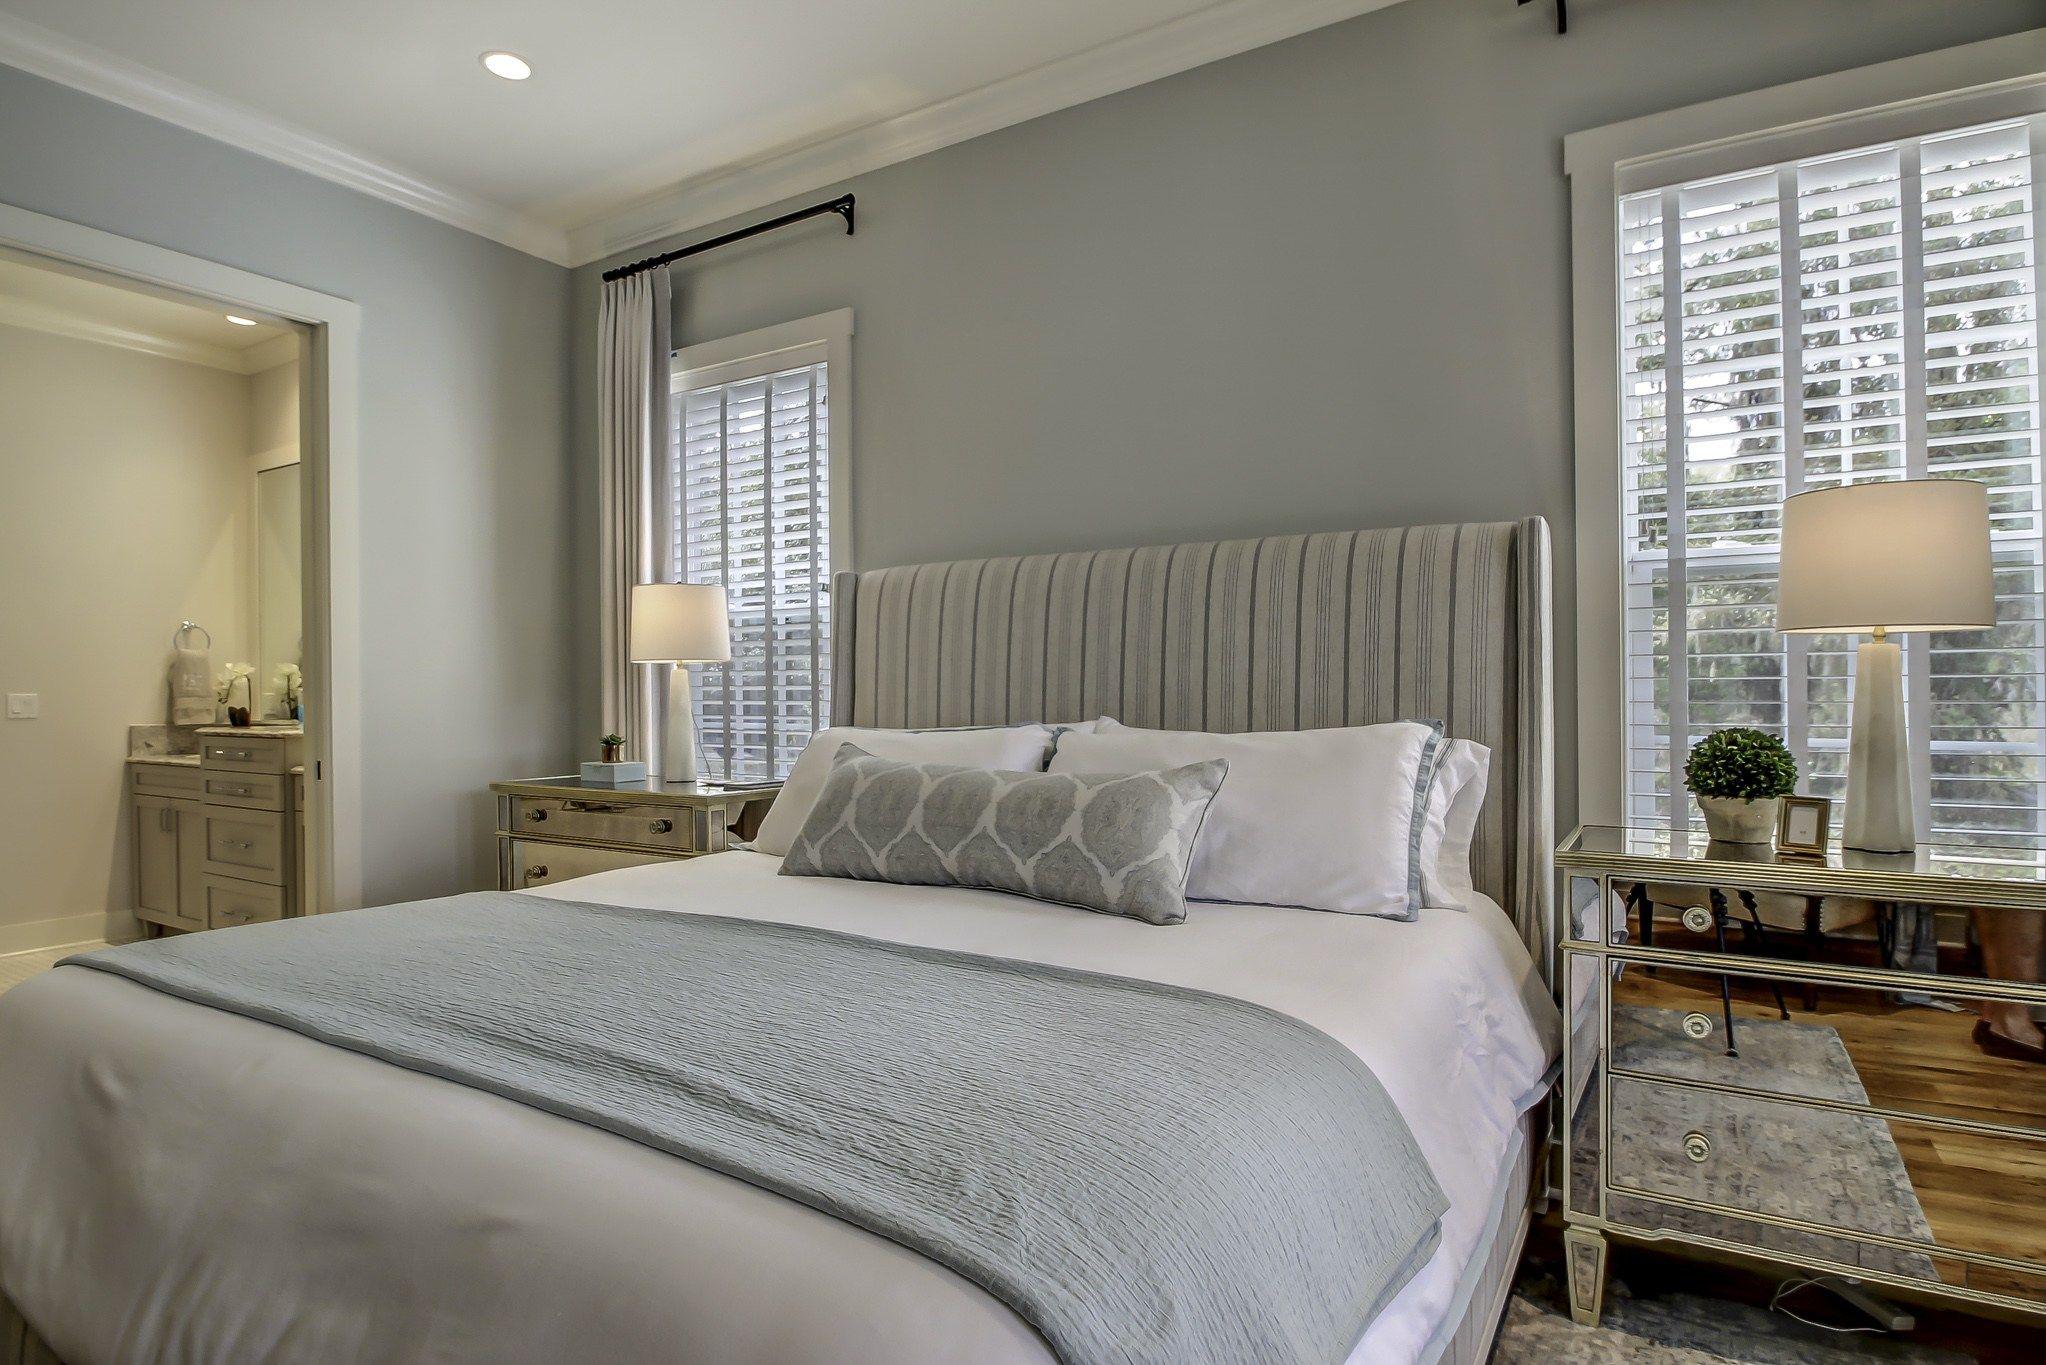 Bedroom Ideas Master Relaxing